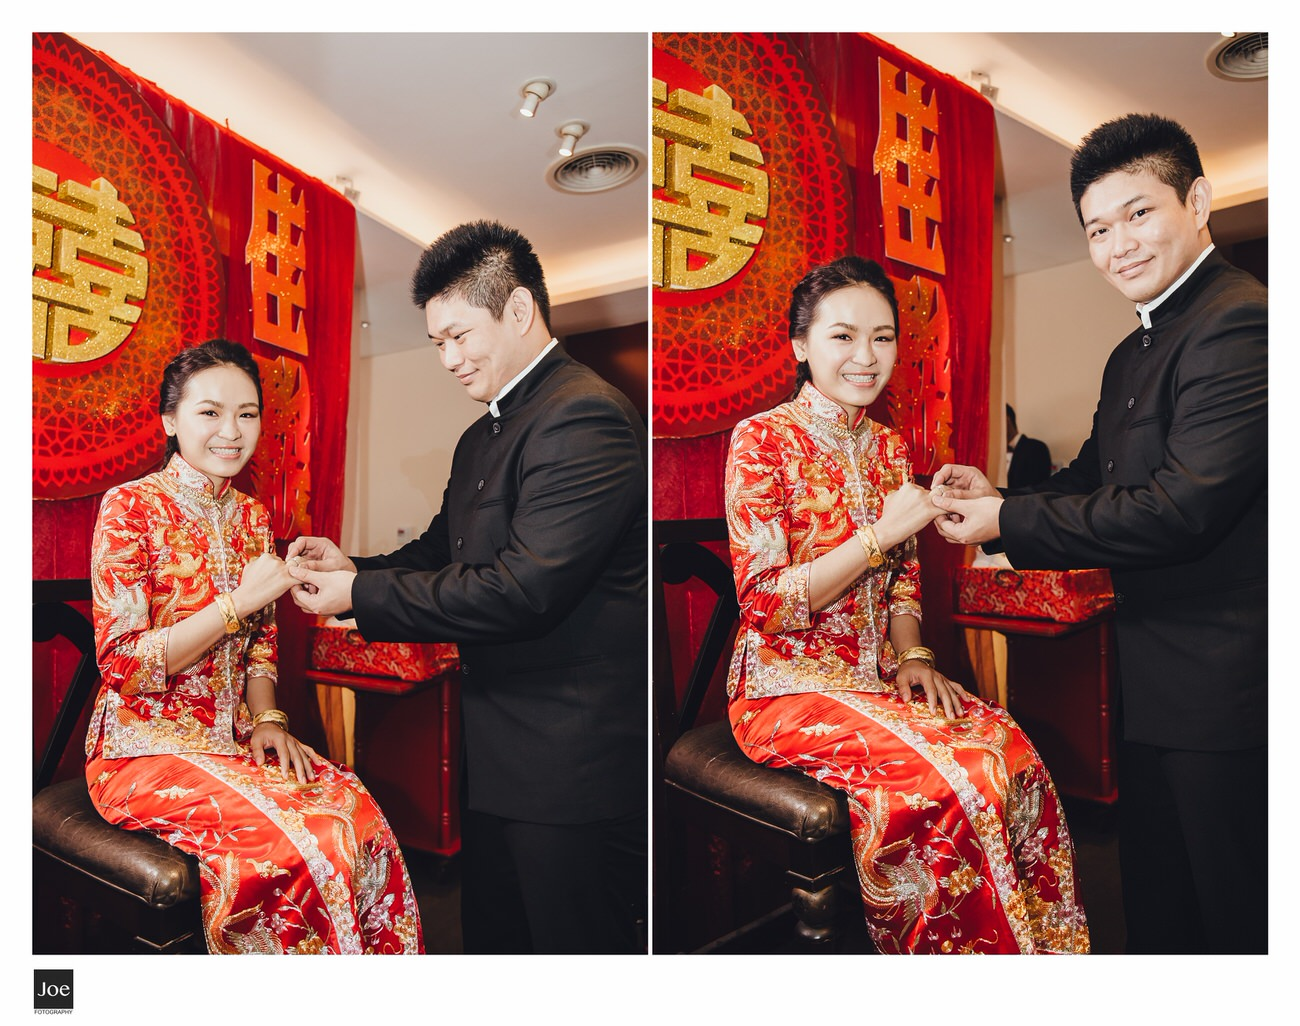 grand-hilai-hotel-wedding-daniel-yvette-joe-fotography-027.jpg